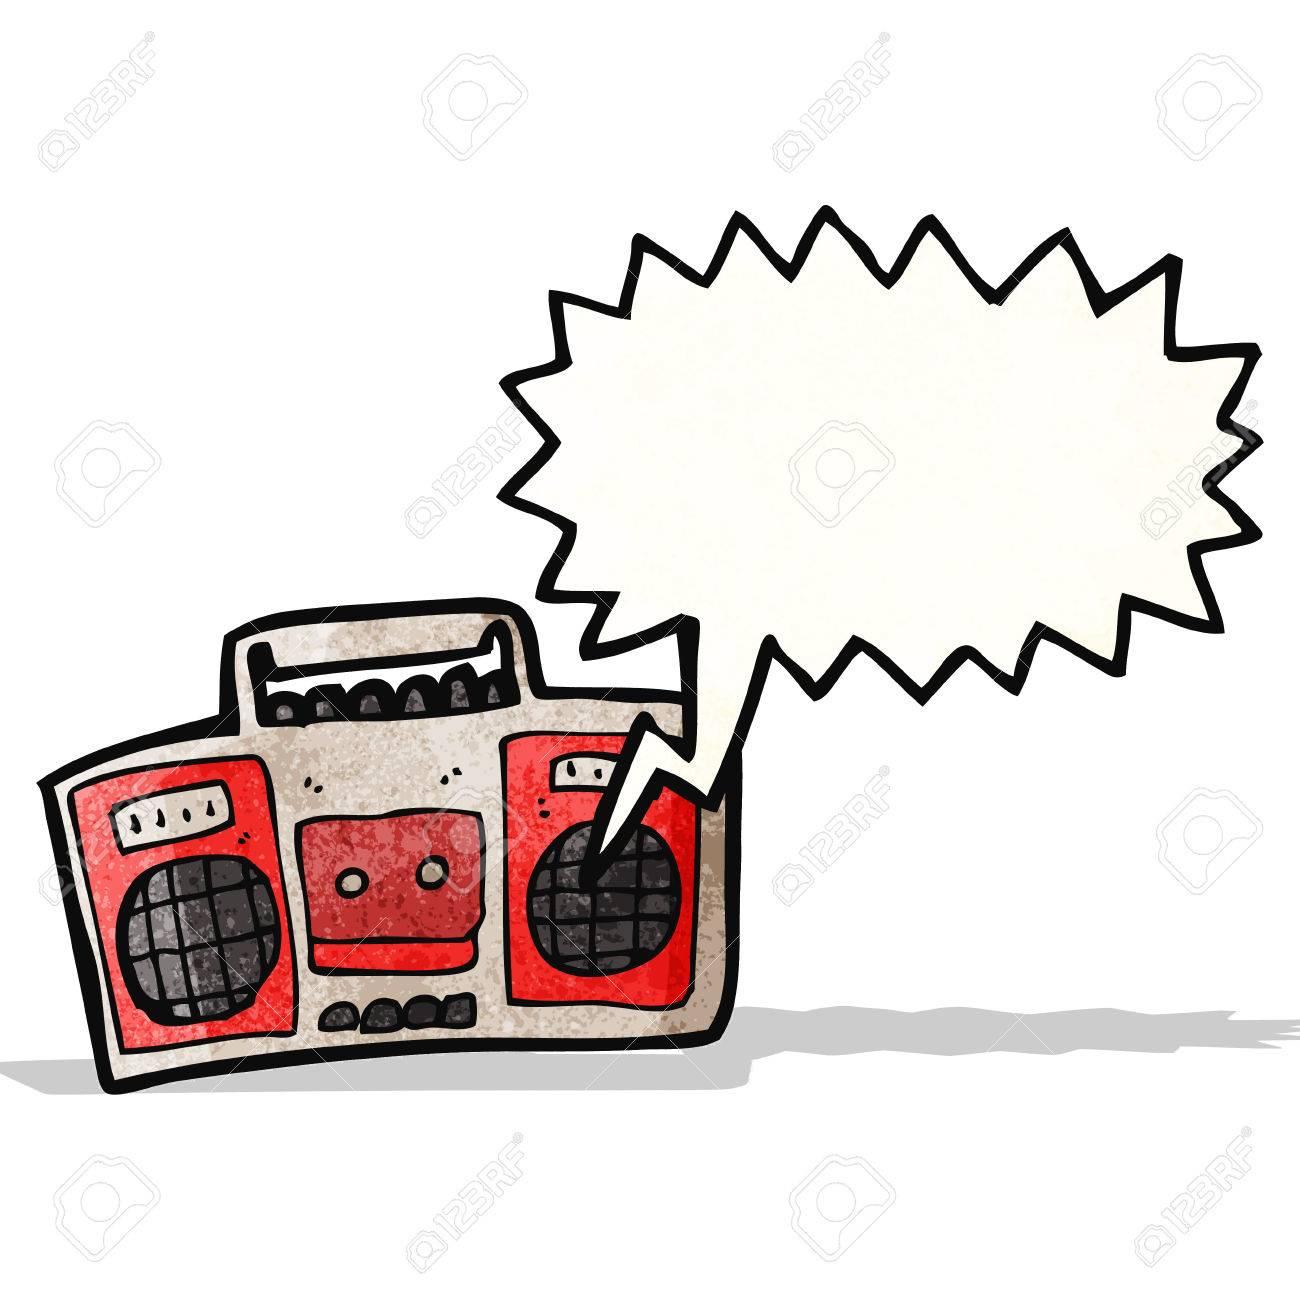 Cartoon Radio Royalty Free Cliparts Vectors And Stock Illustration Image 32206806